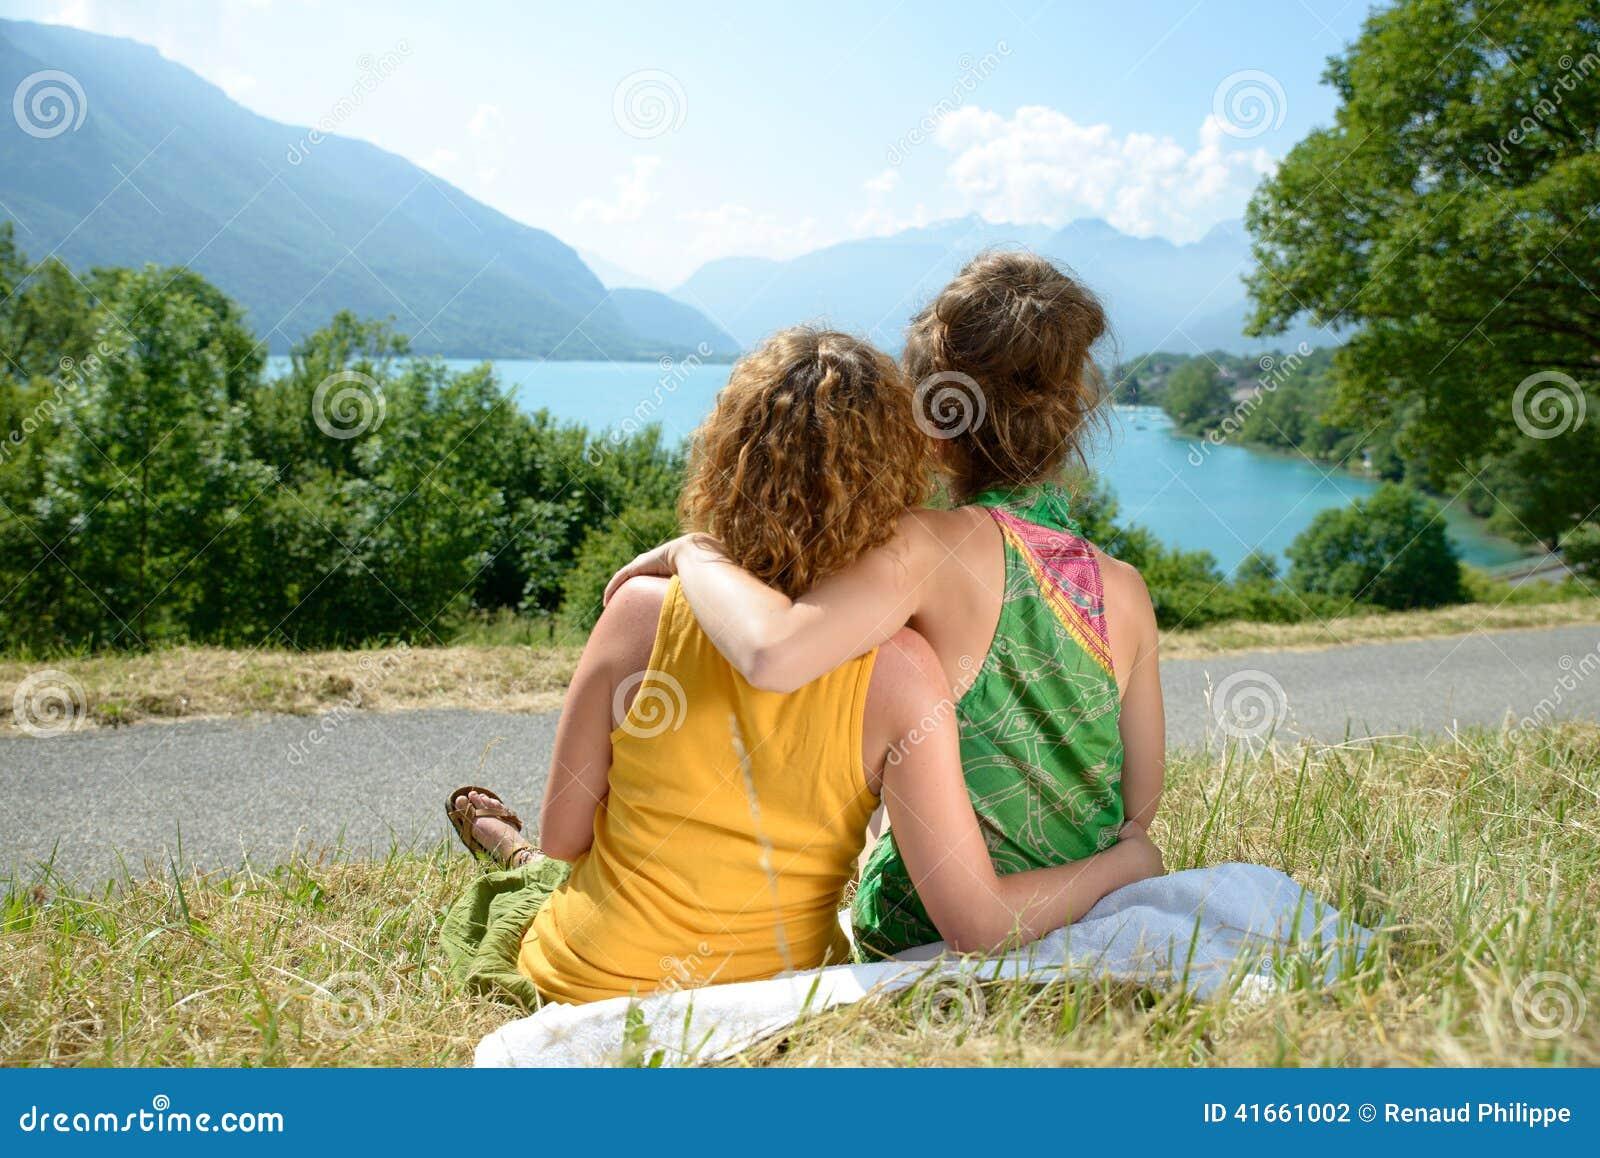 2лесбиянки на природе